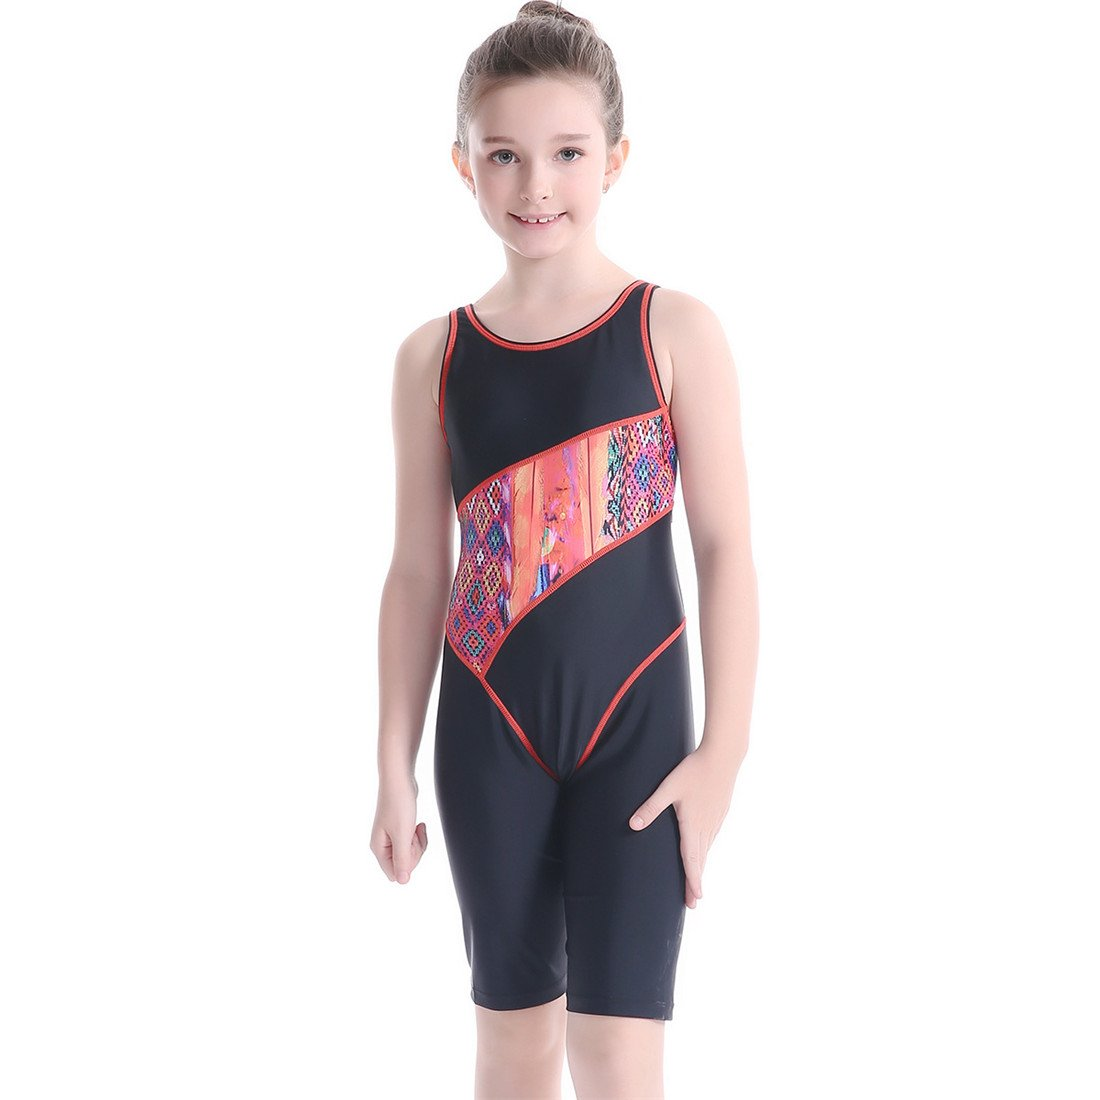 SANANG Girls' Splice Athletic Competitive Full Knee Length One Piece Swimsuit Swimwear Legsuit